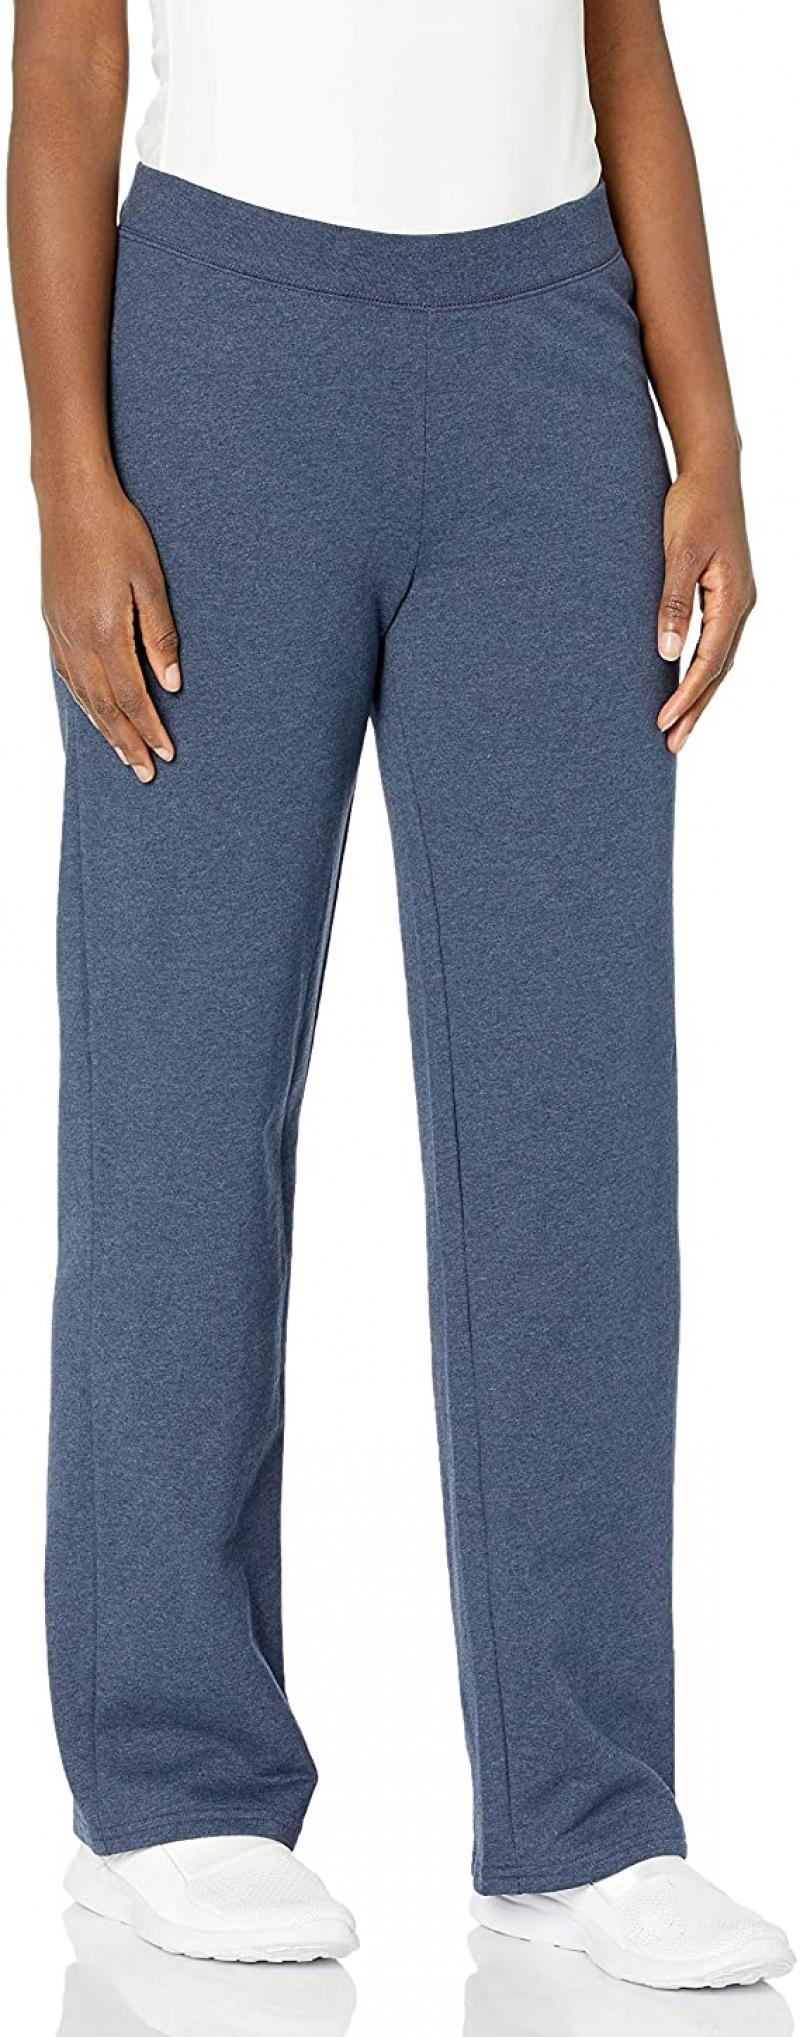 ihocon: Hanes Women's EcoSmart Petite Open Bottom Leg Sweatpants 女士運動褲